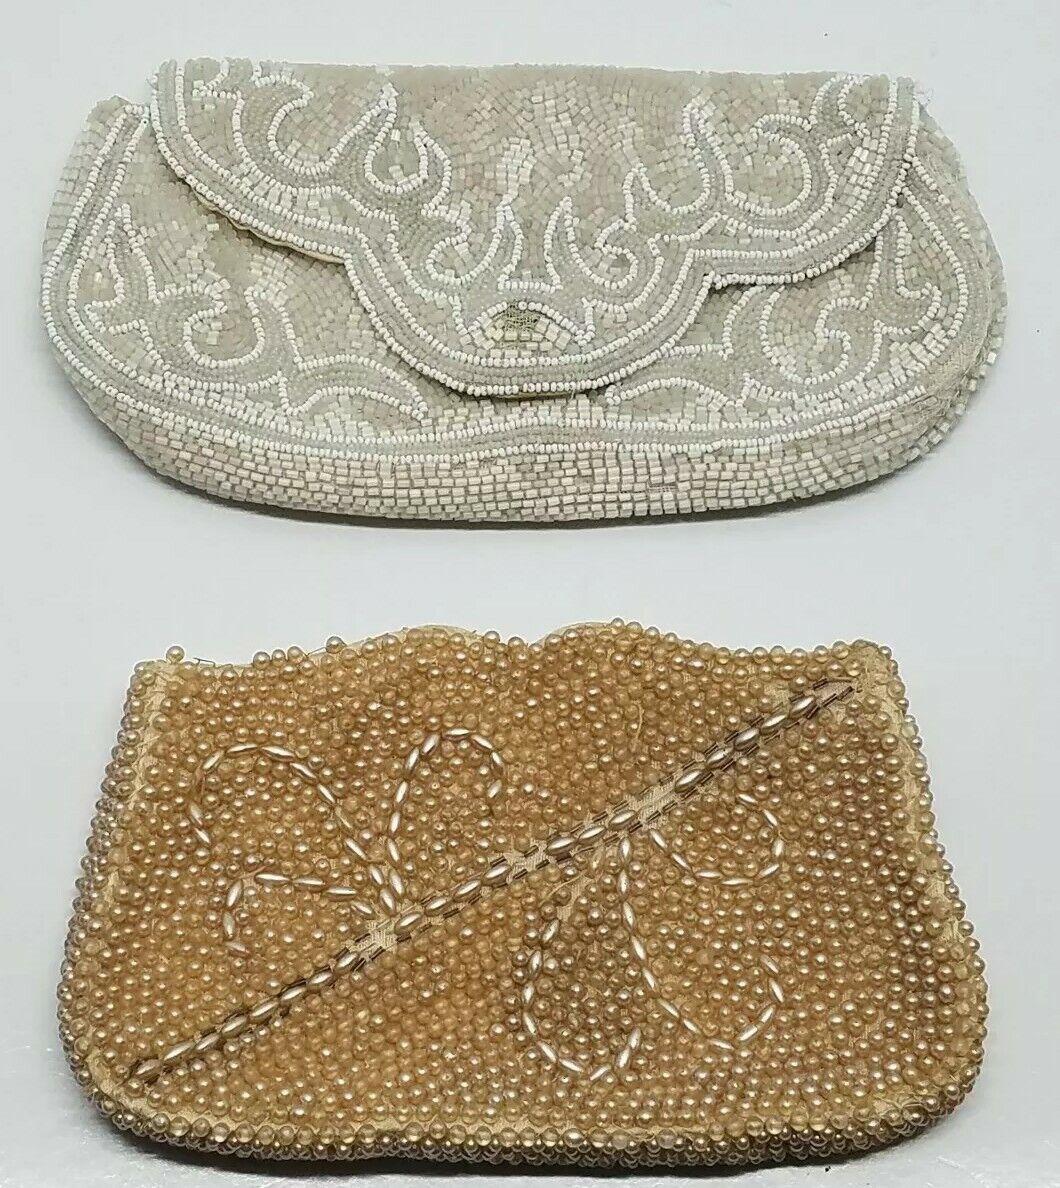 2 Vtg Handmade White Pearl Accent Beaded Clutch Purse Lot France Debbie Japan